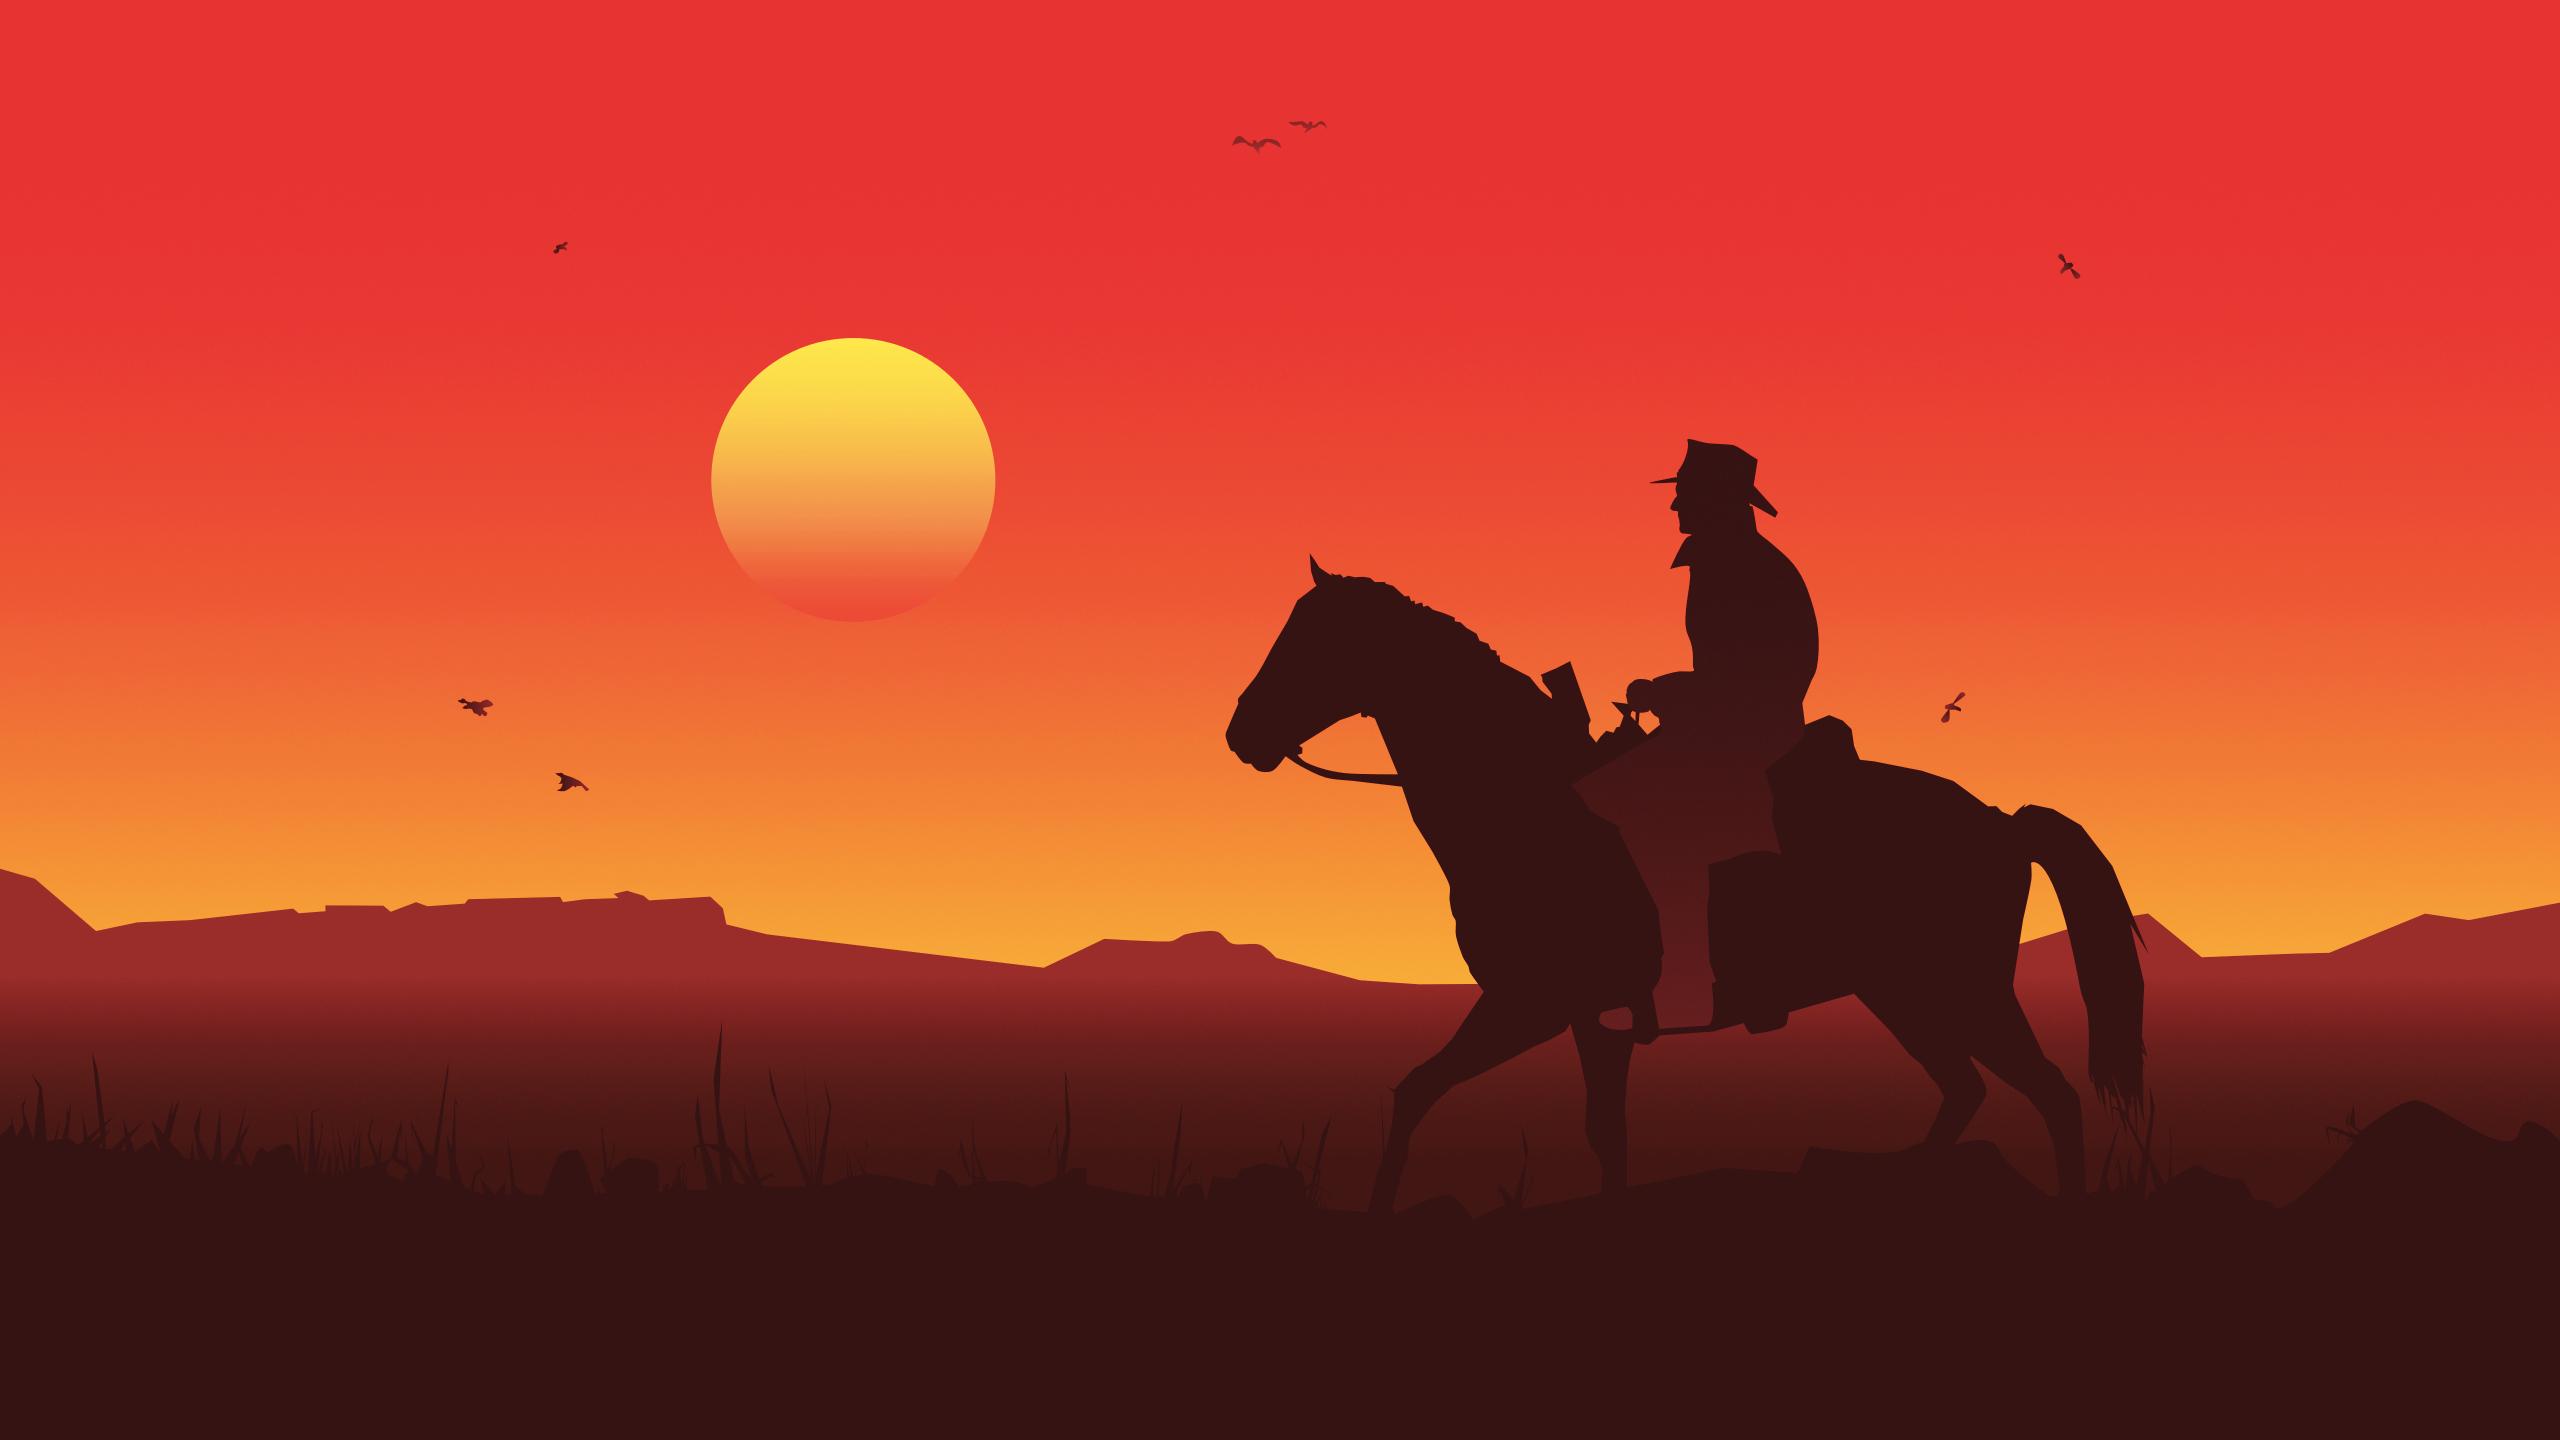 2560x1440 Red Dead Redemption 2 1440P Resolution Wallpaper ...